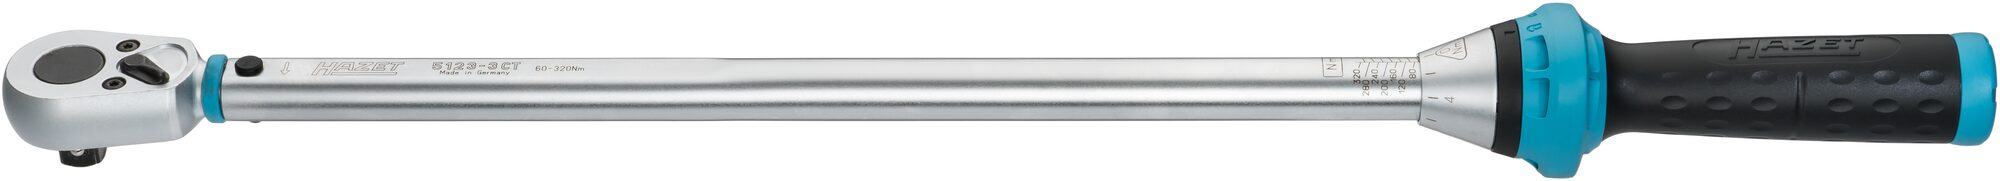 HAZET Drehmoment-Schlüssel 5123-3CT ∙ Nm min-max: 60–320 Nm ∙ Toleranz: 3% ∙ Vierkant massiv 12,5 mm (1/2 Zoll)